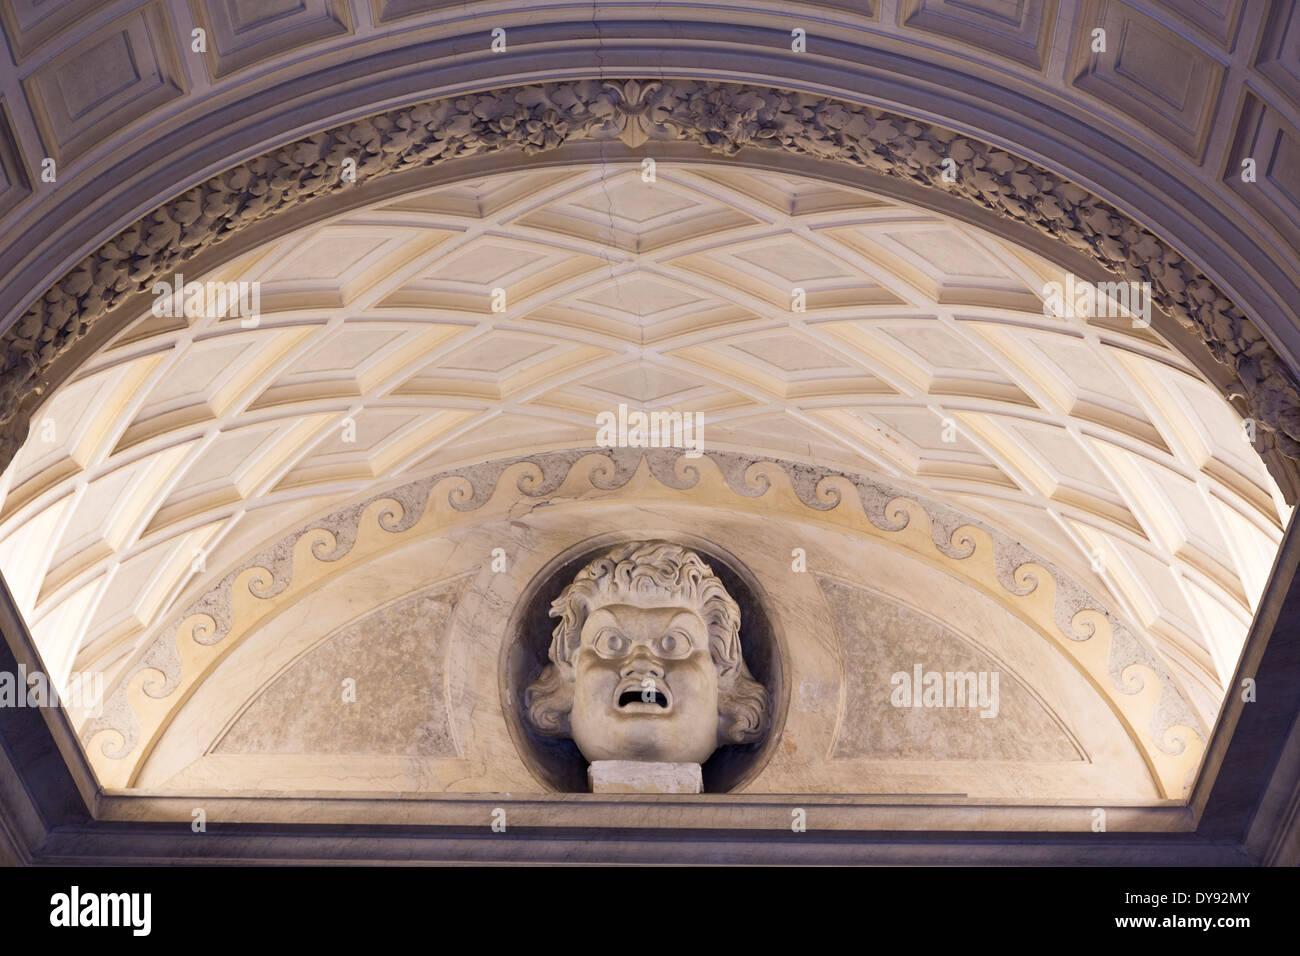 vault, gallery of Roman sculpture, Vatican Museum, Rome, Italy - Stock Image